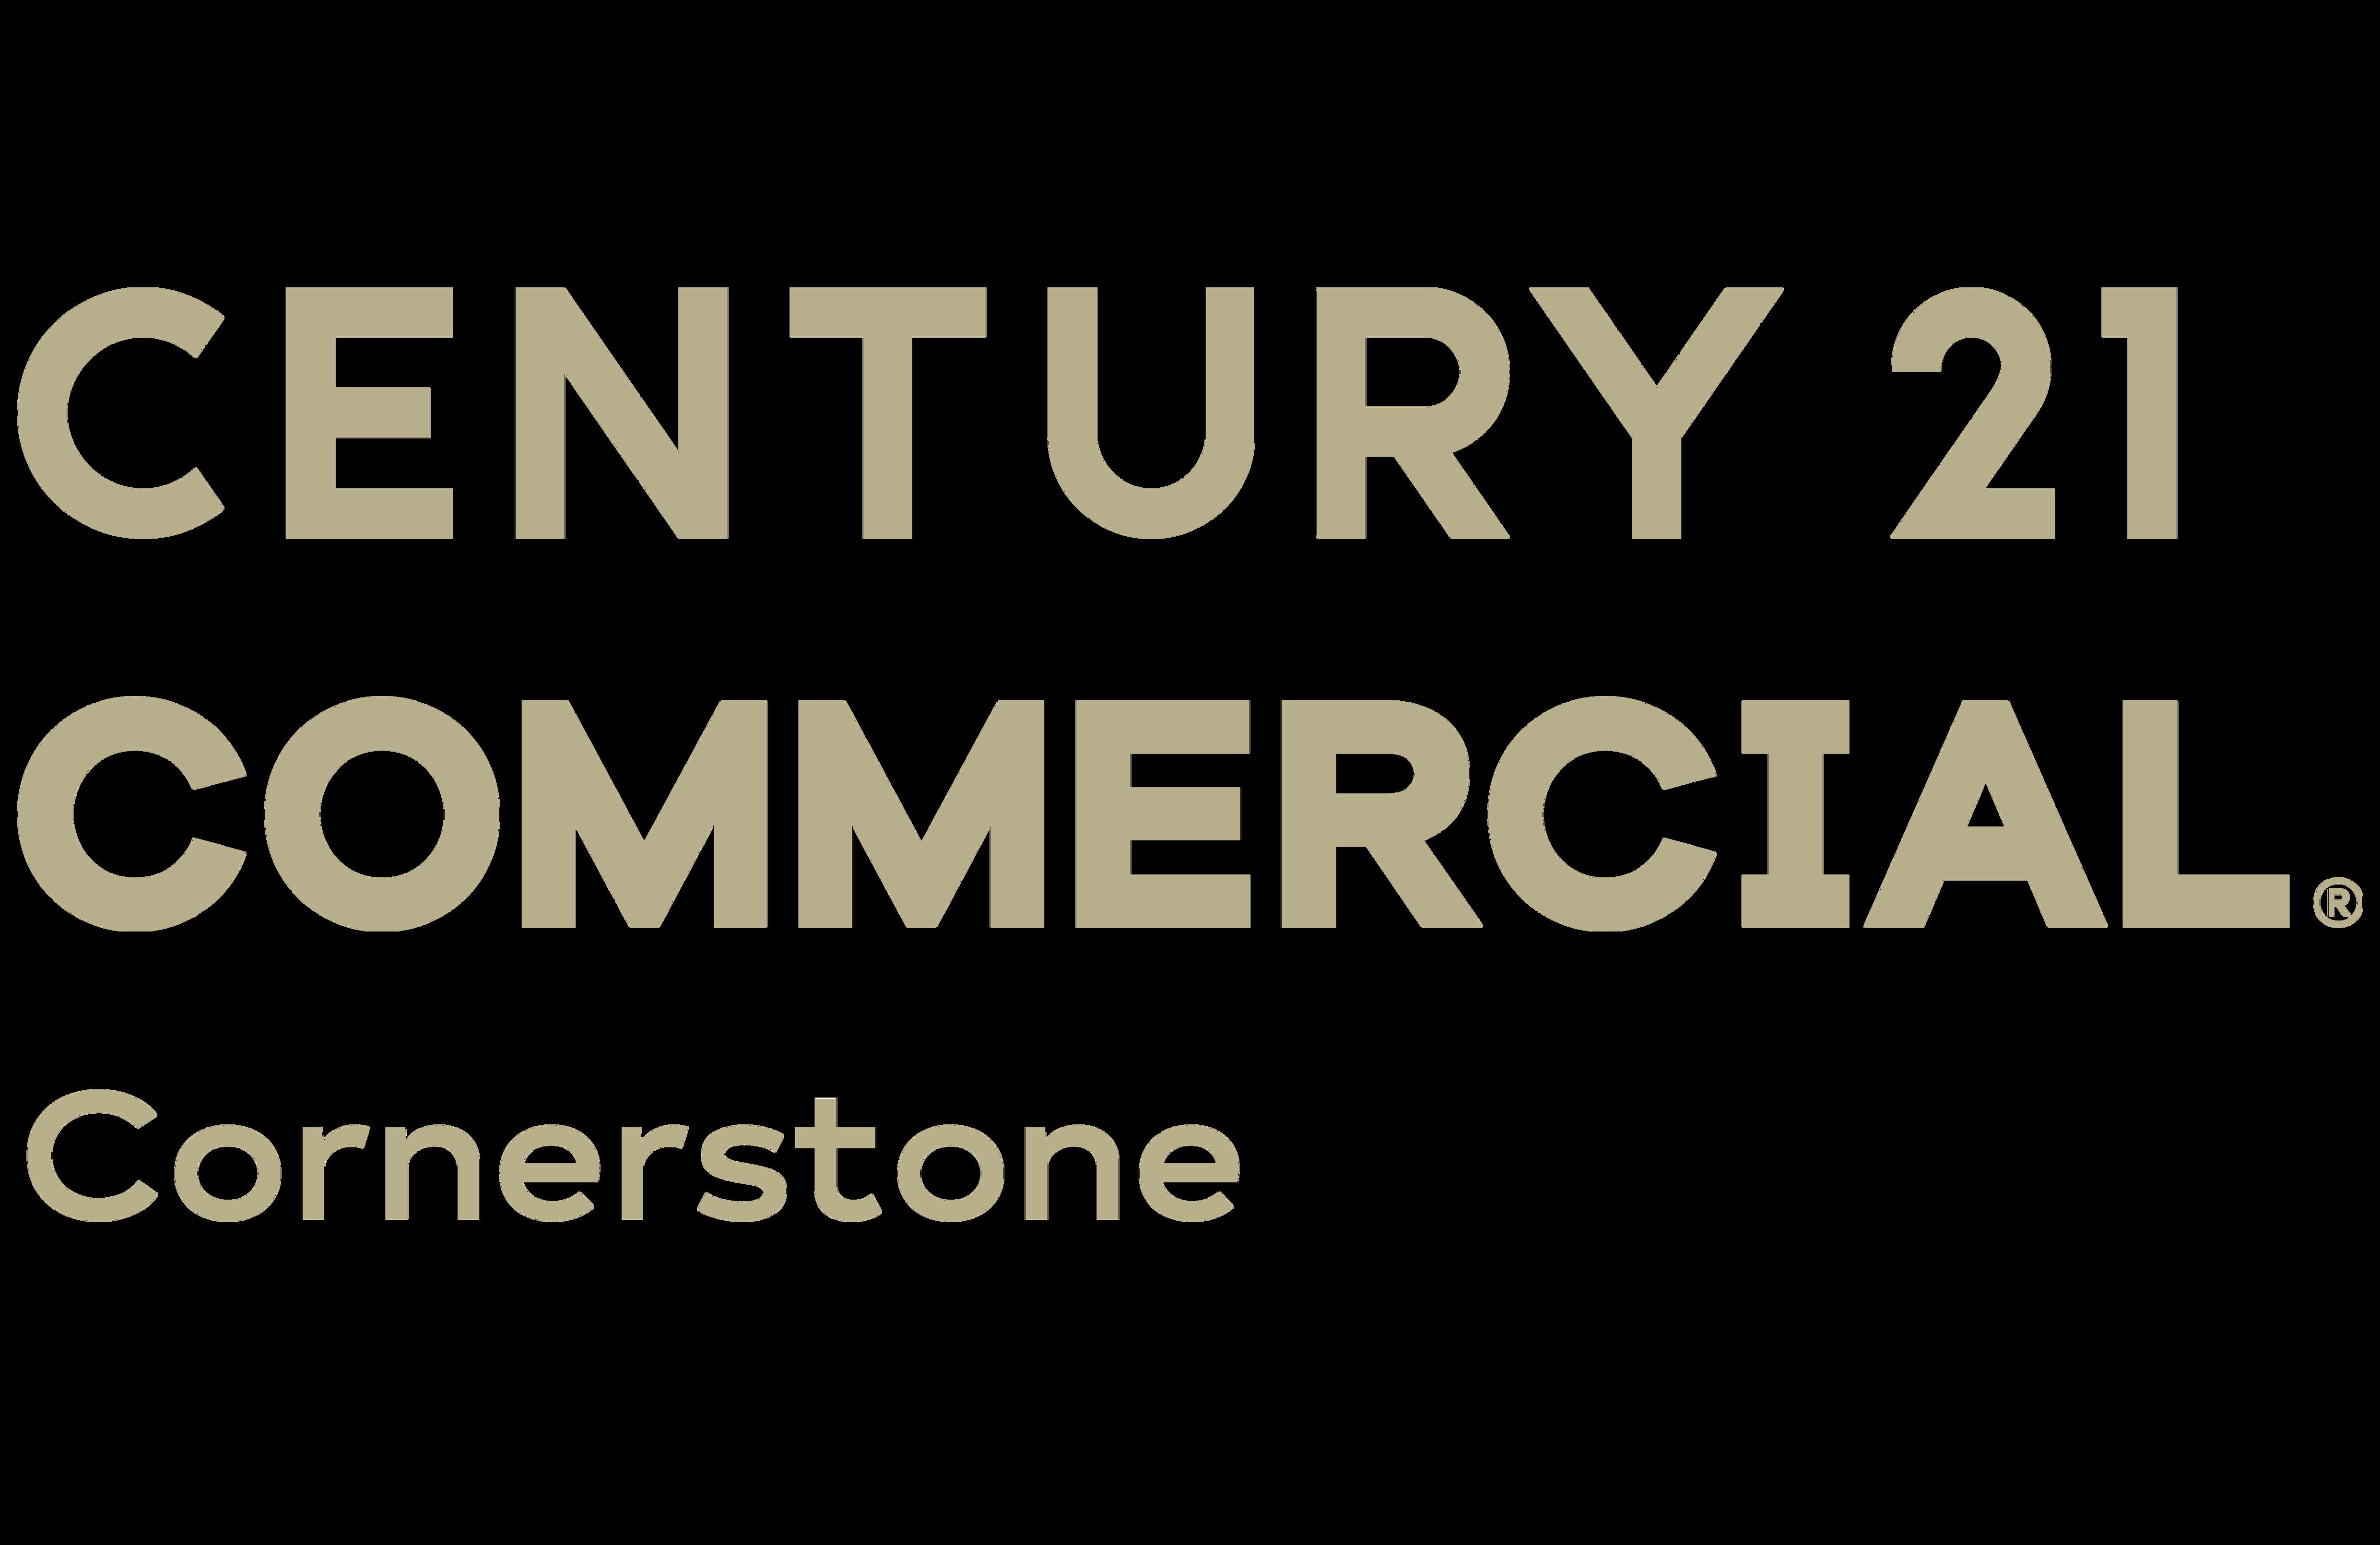 CENTURY 21 Cornerstone